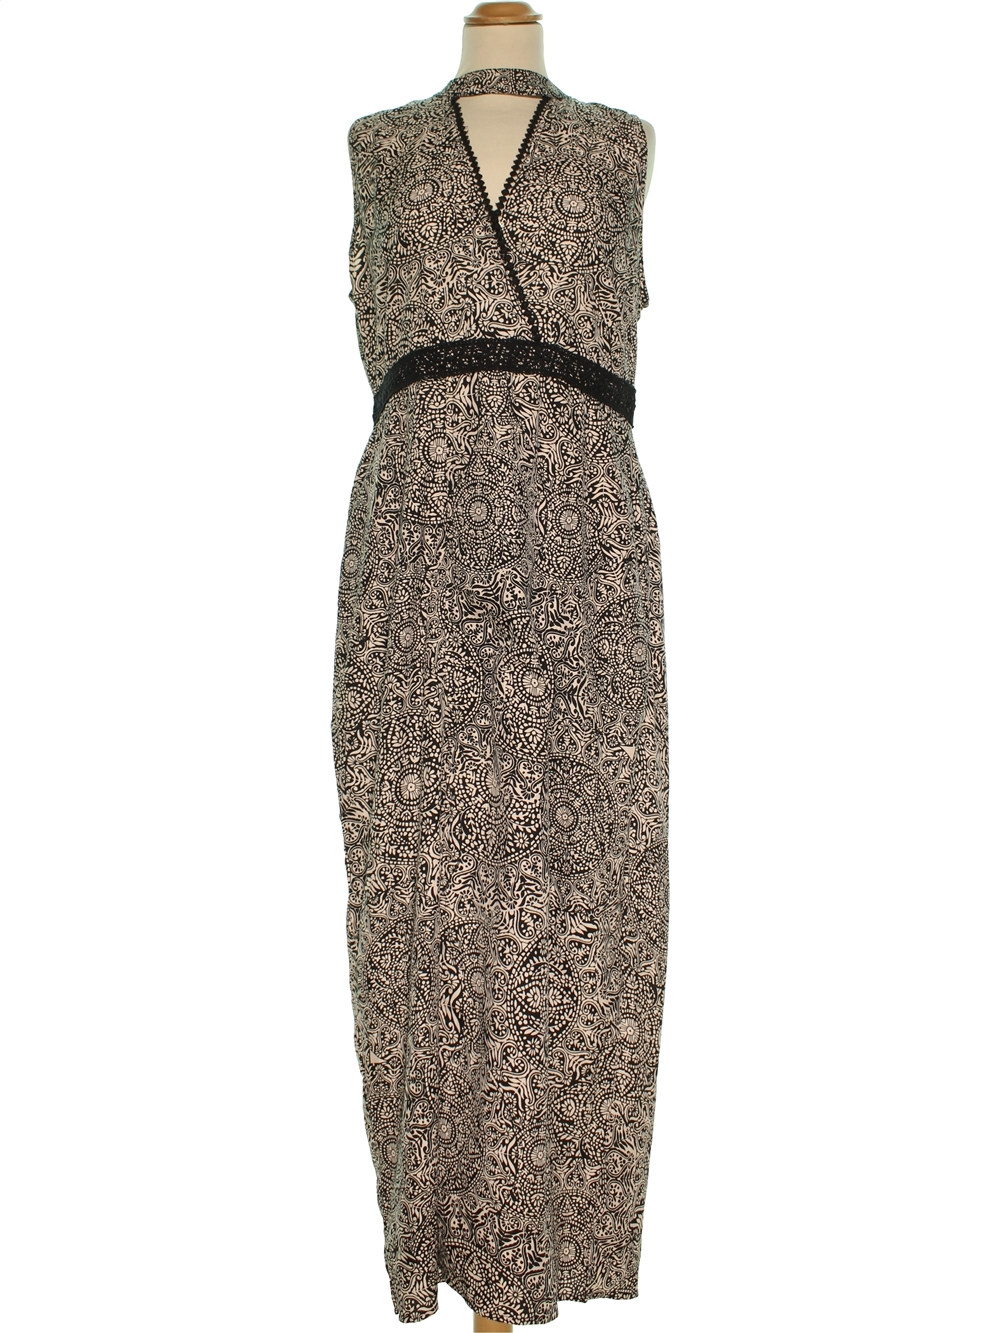 super populaire 8673e 19cea Robe Femme BLANCHE PORTE 42 (L - T2) pas cher, 7.99 € - #1136307